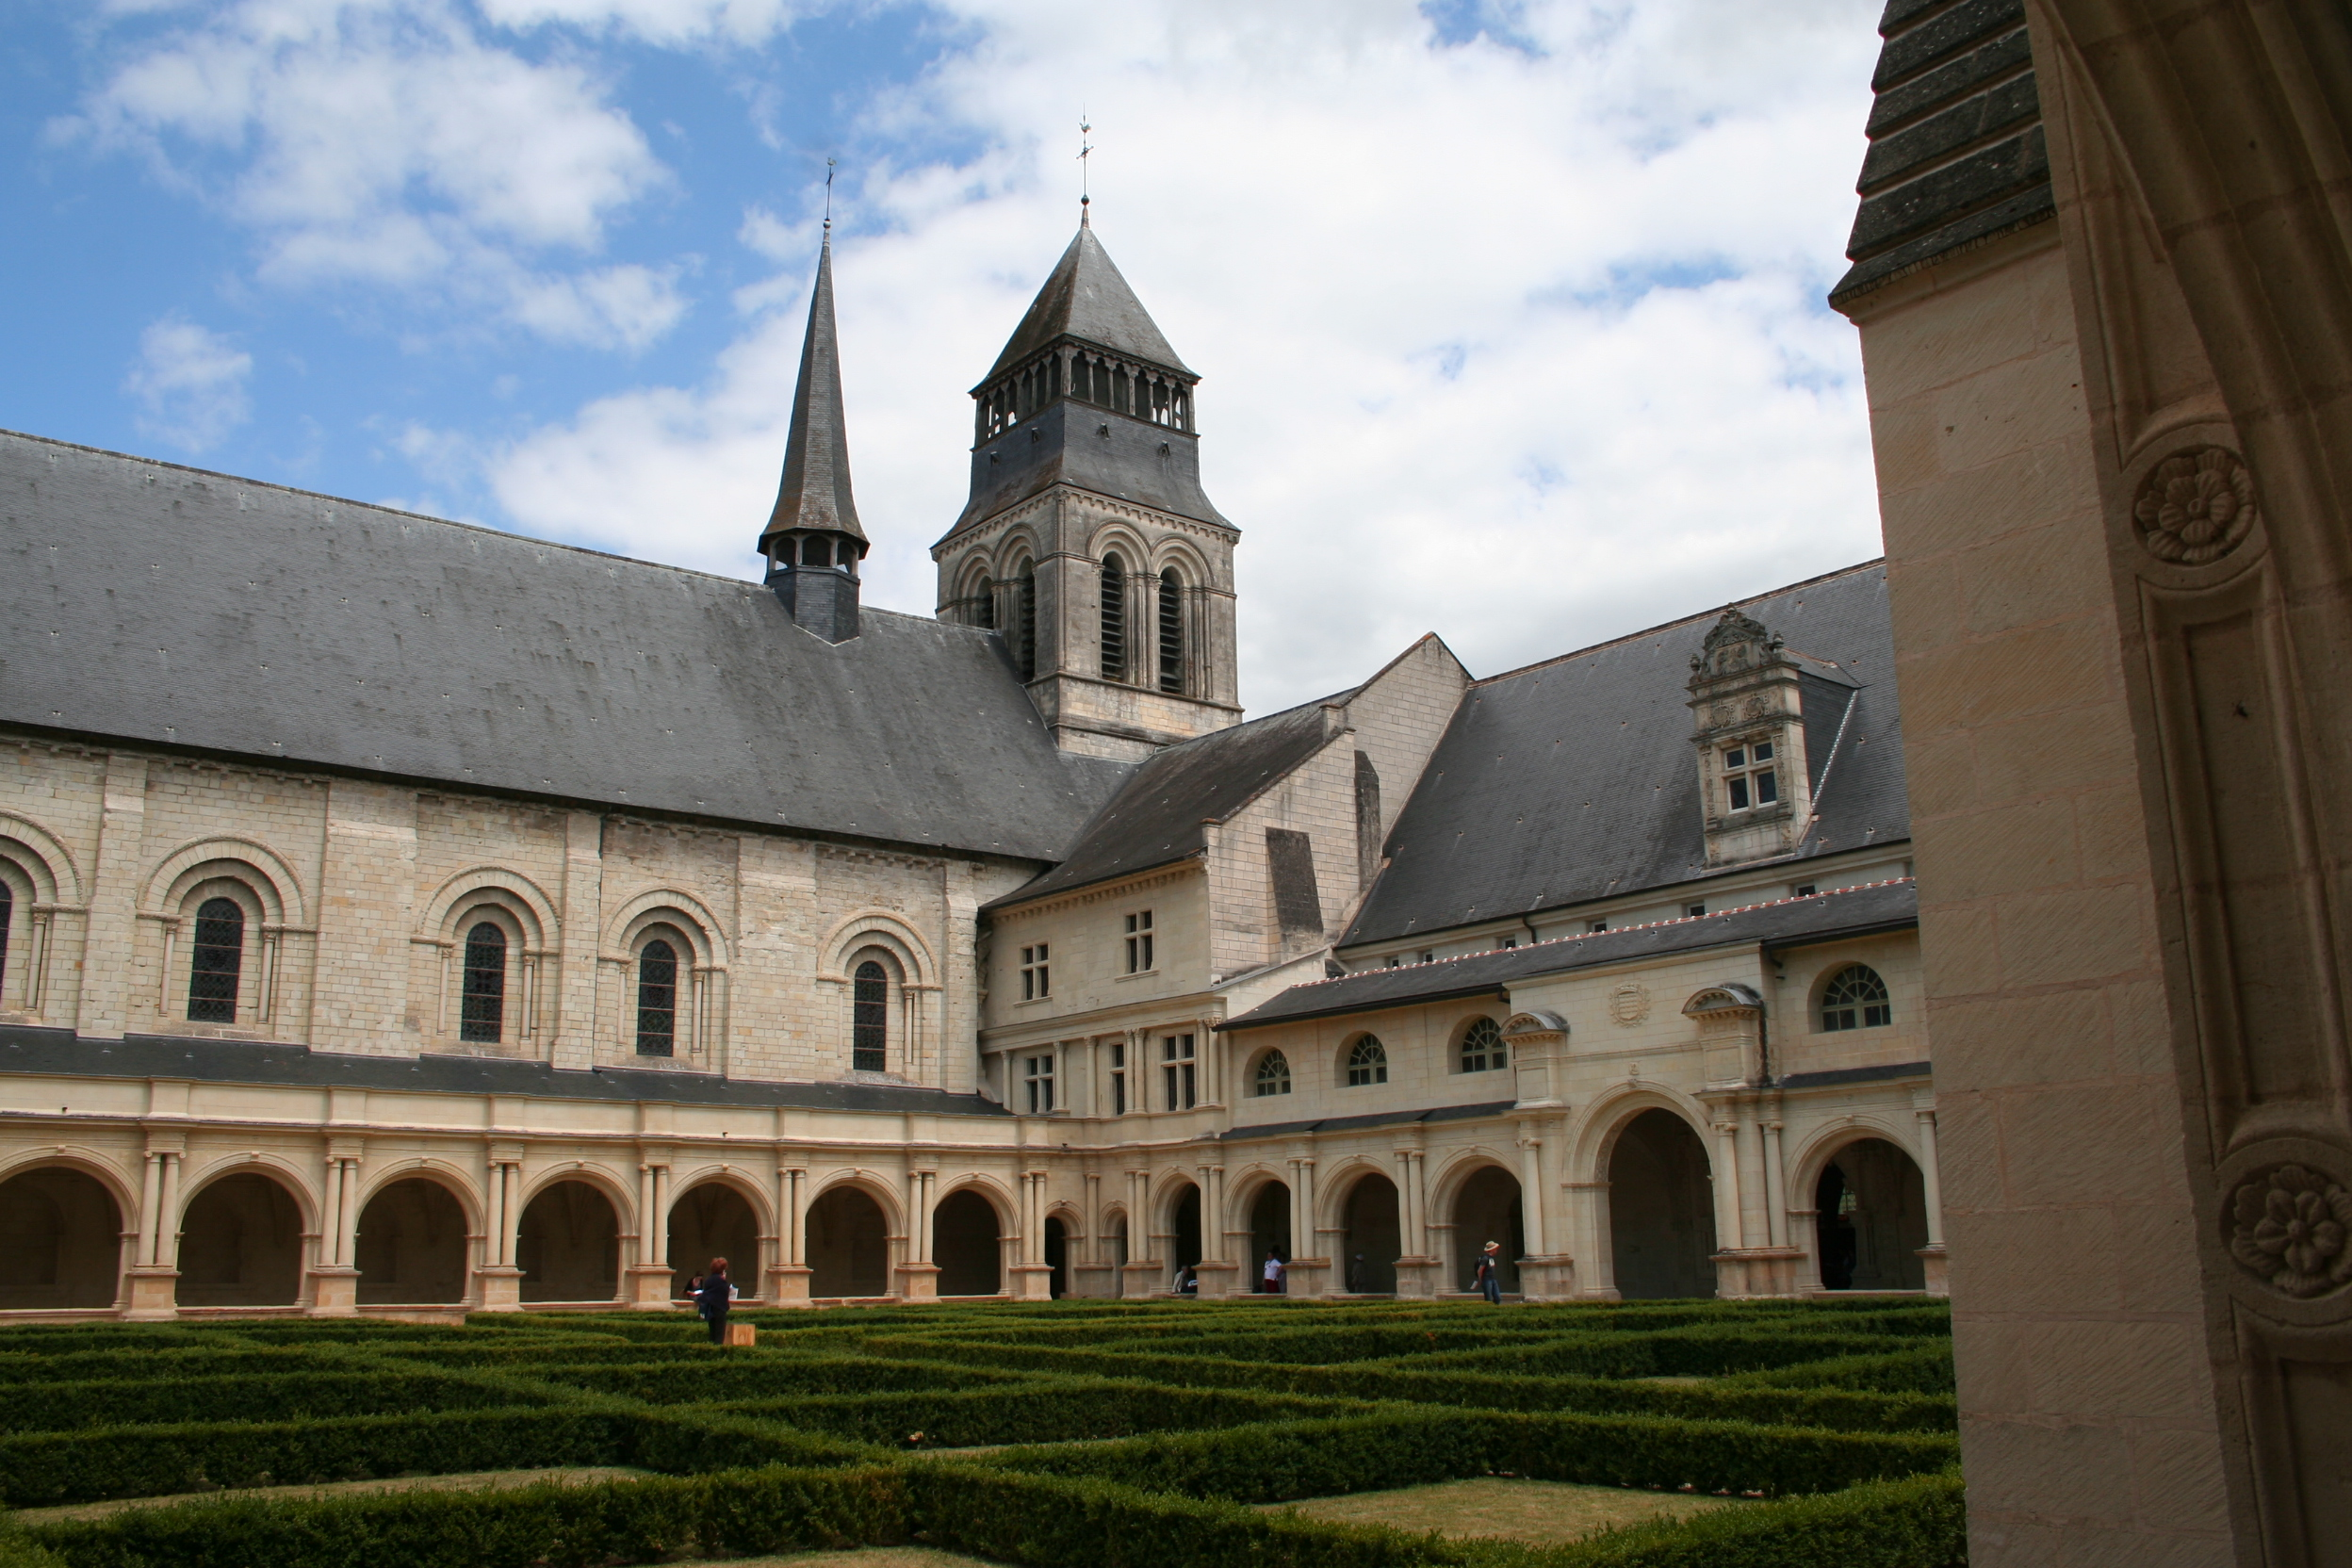 Abbaye De Fontevraud Hotel Restaurant Menu Premier Chapitre